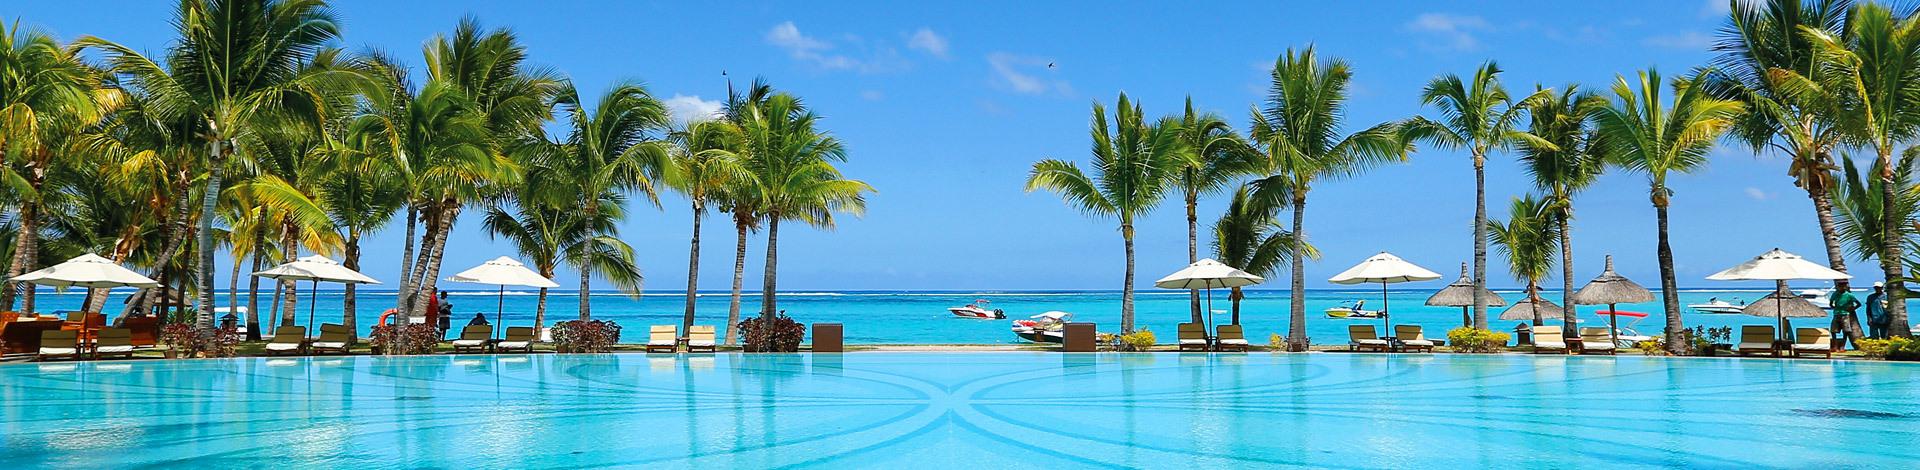 beachcomber mauritius partner offer ile maurice